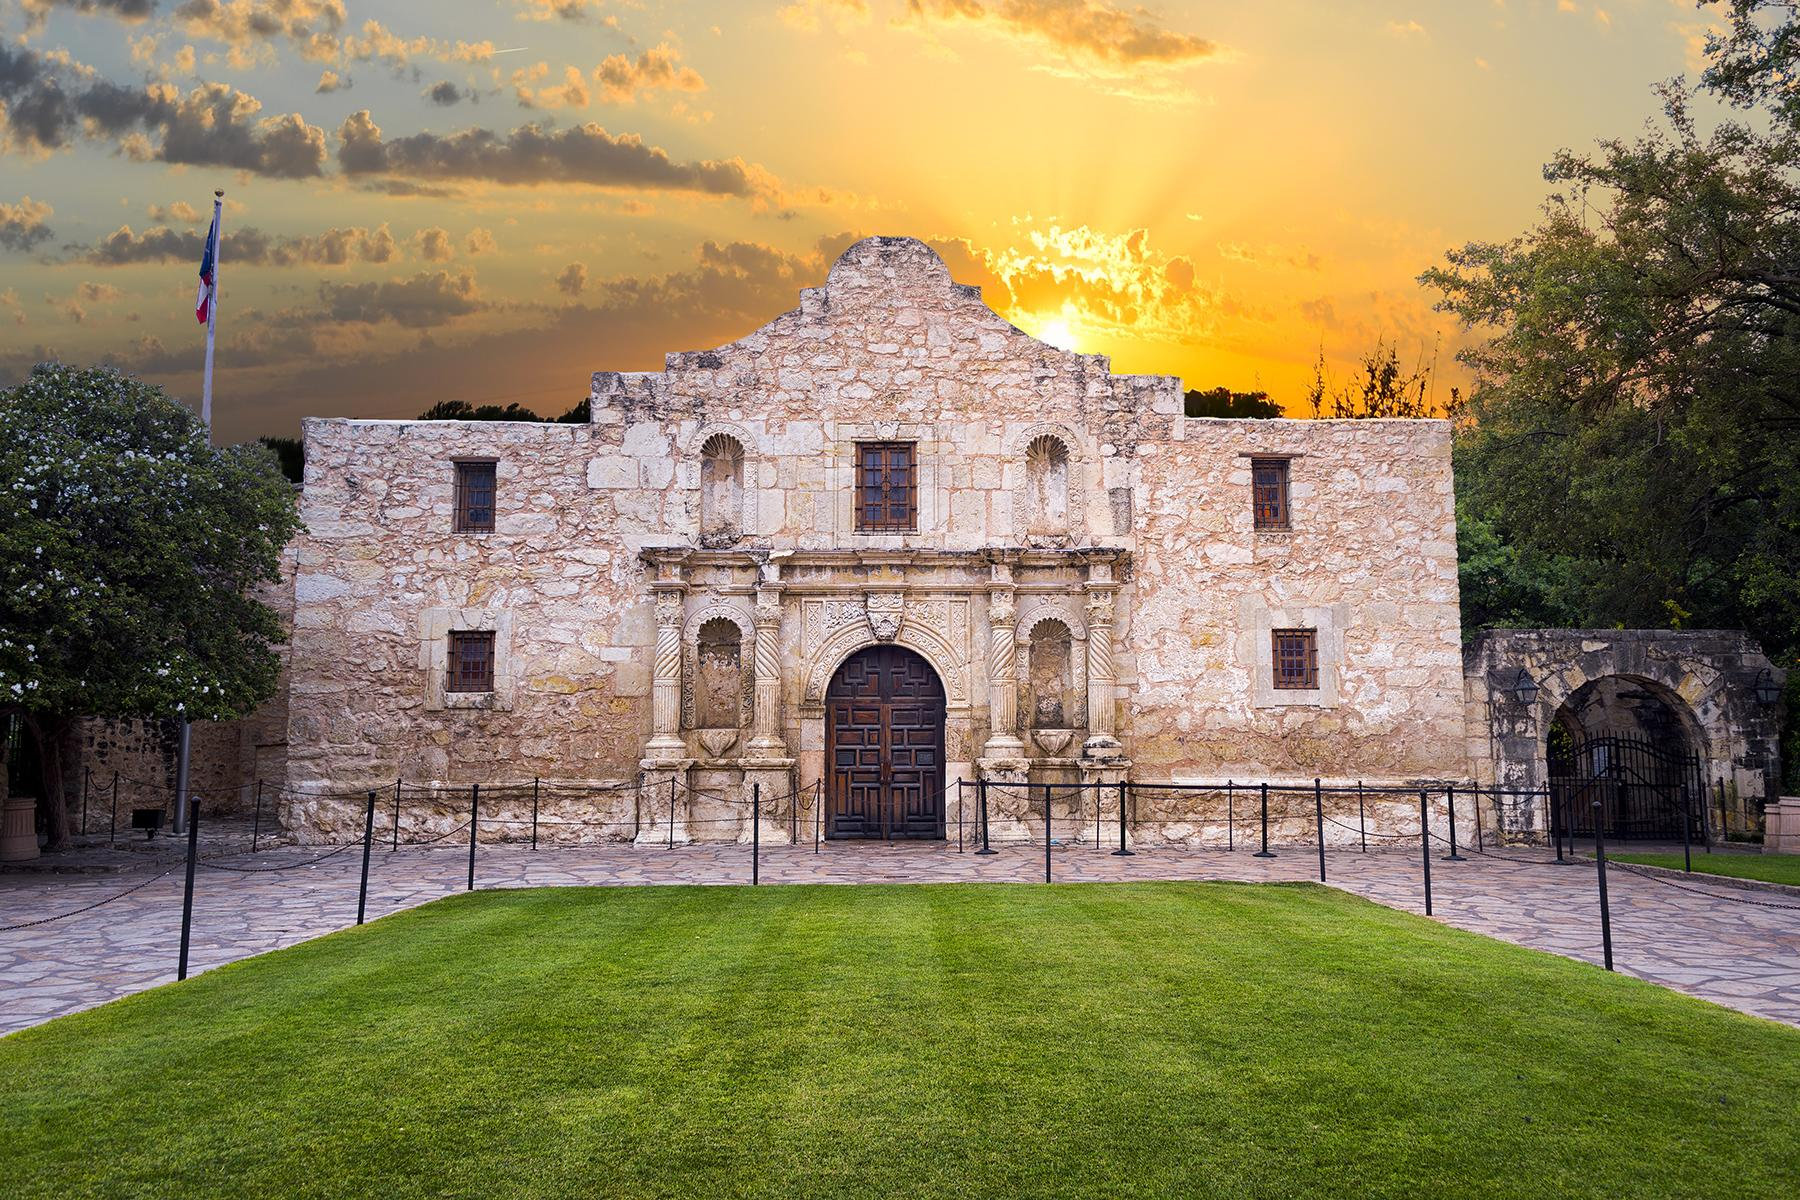 Menjelajahi Sejarah di Tempat Tertua Amerika I